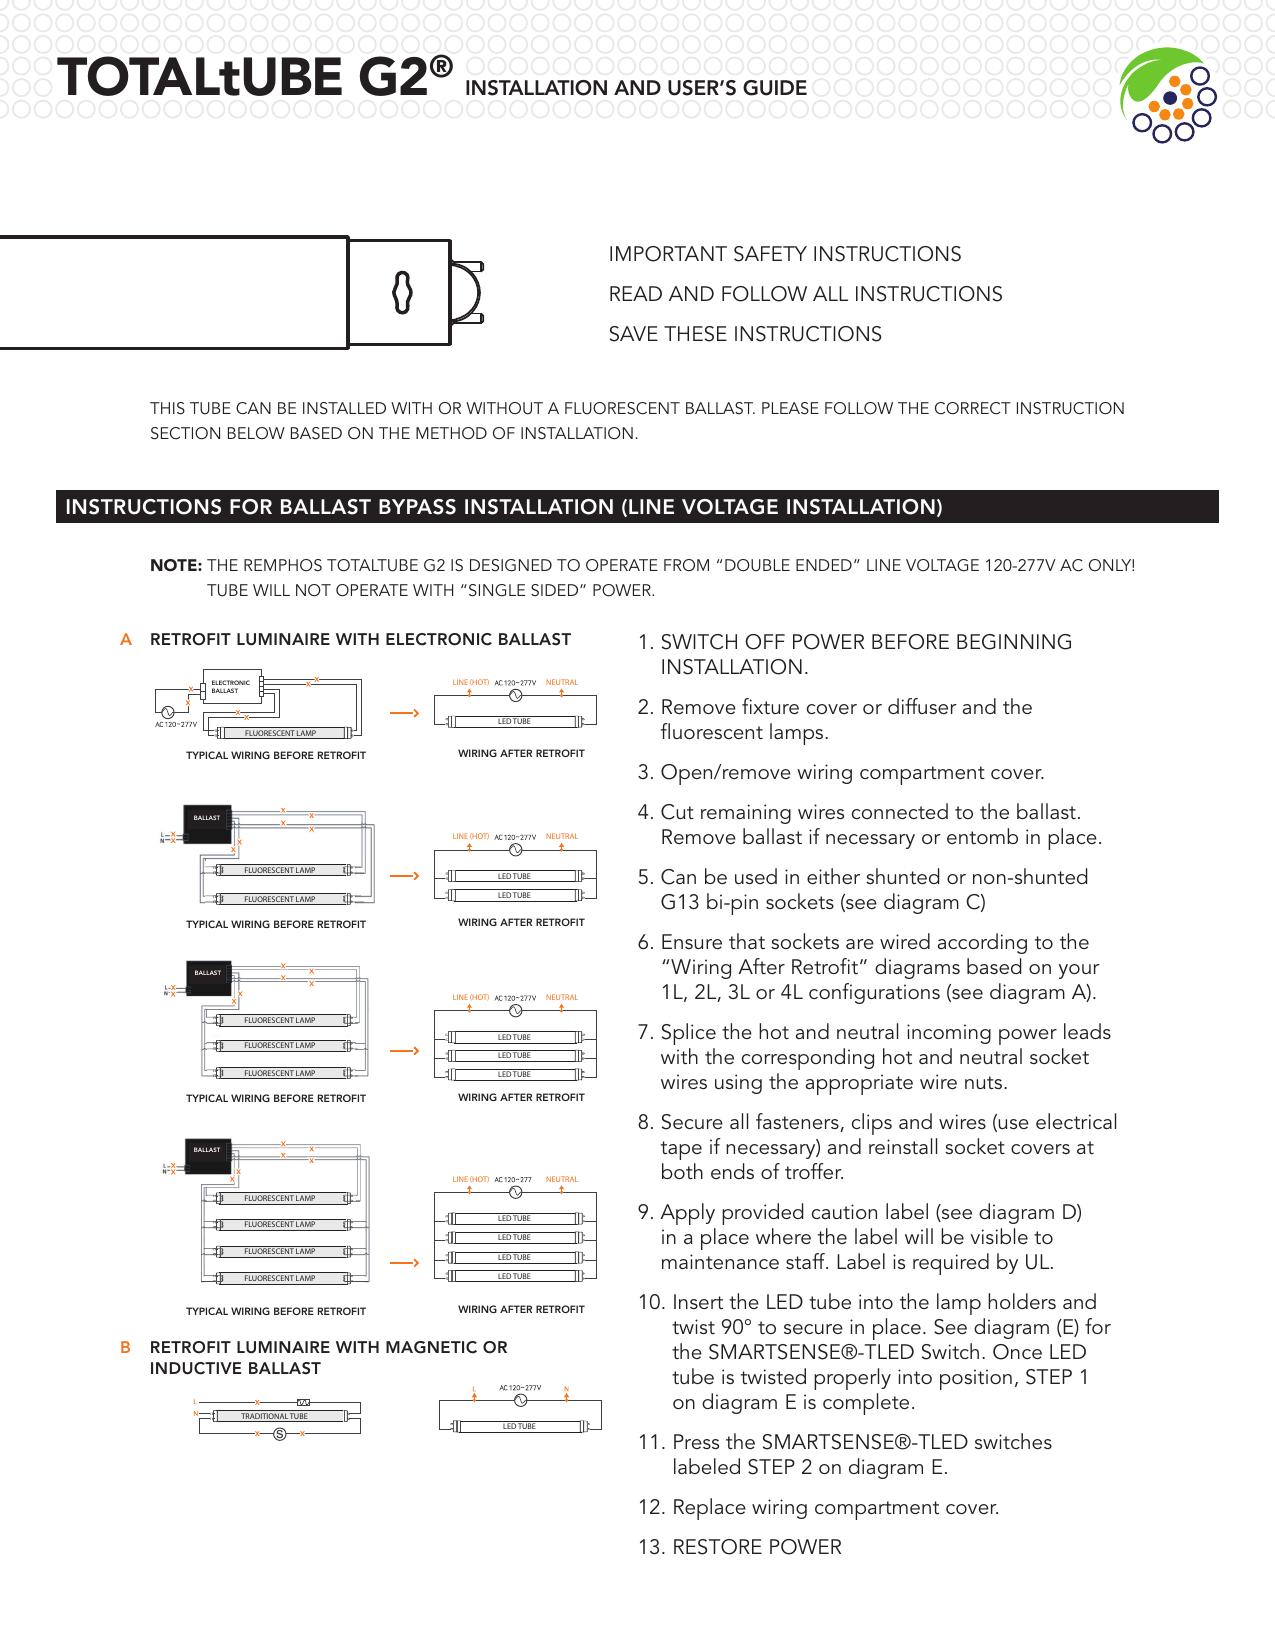 fluorescent lights wiring diagram 5 wire totaltube g2 installguide indd manualzz  totaltube g2 installguide indd manualzz